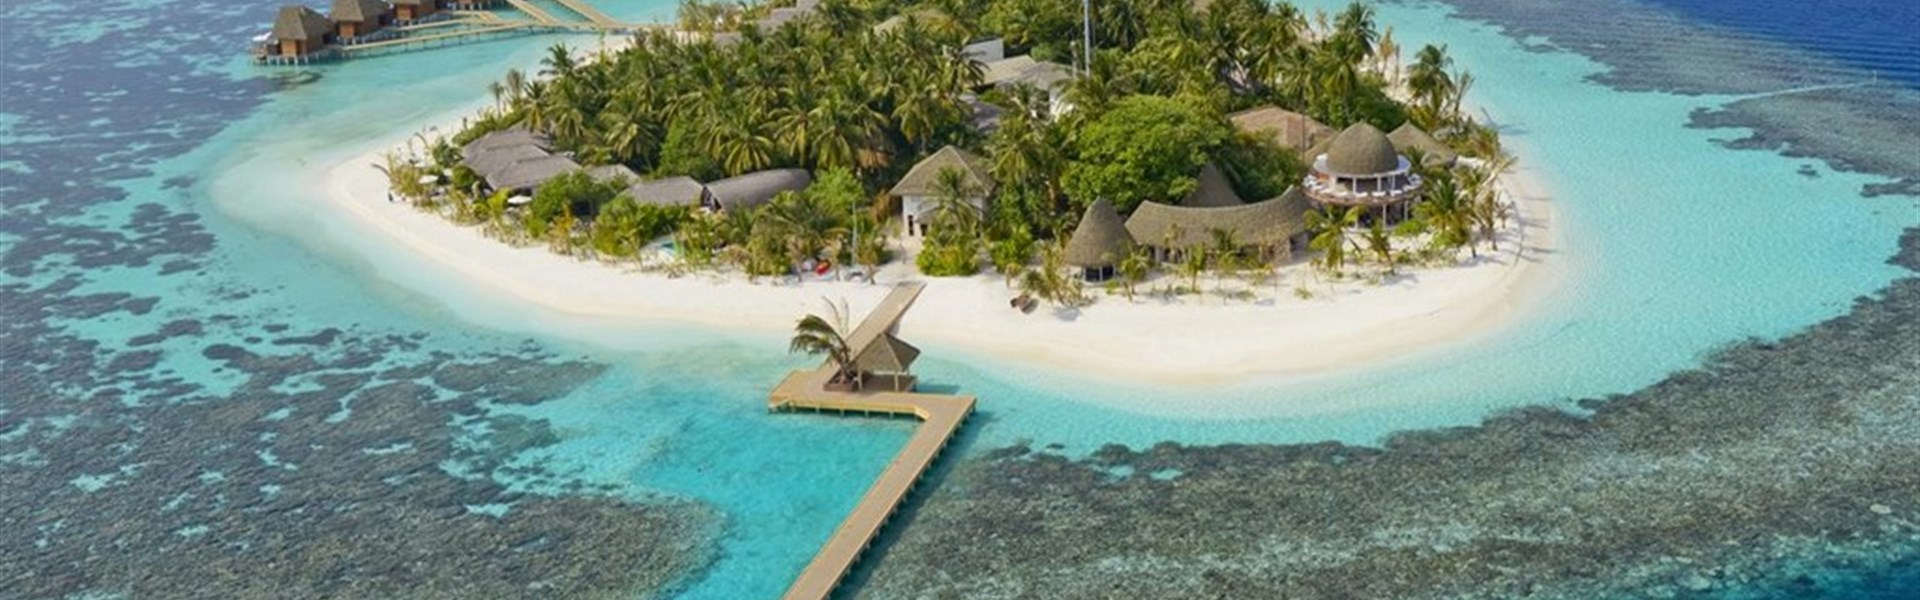 Marco Polo - Kandolhu Maldives -